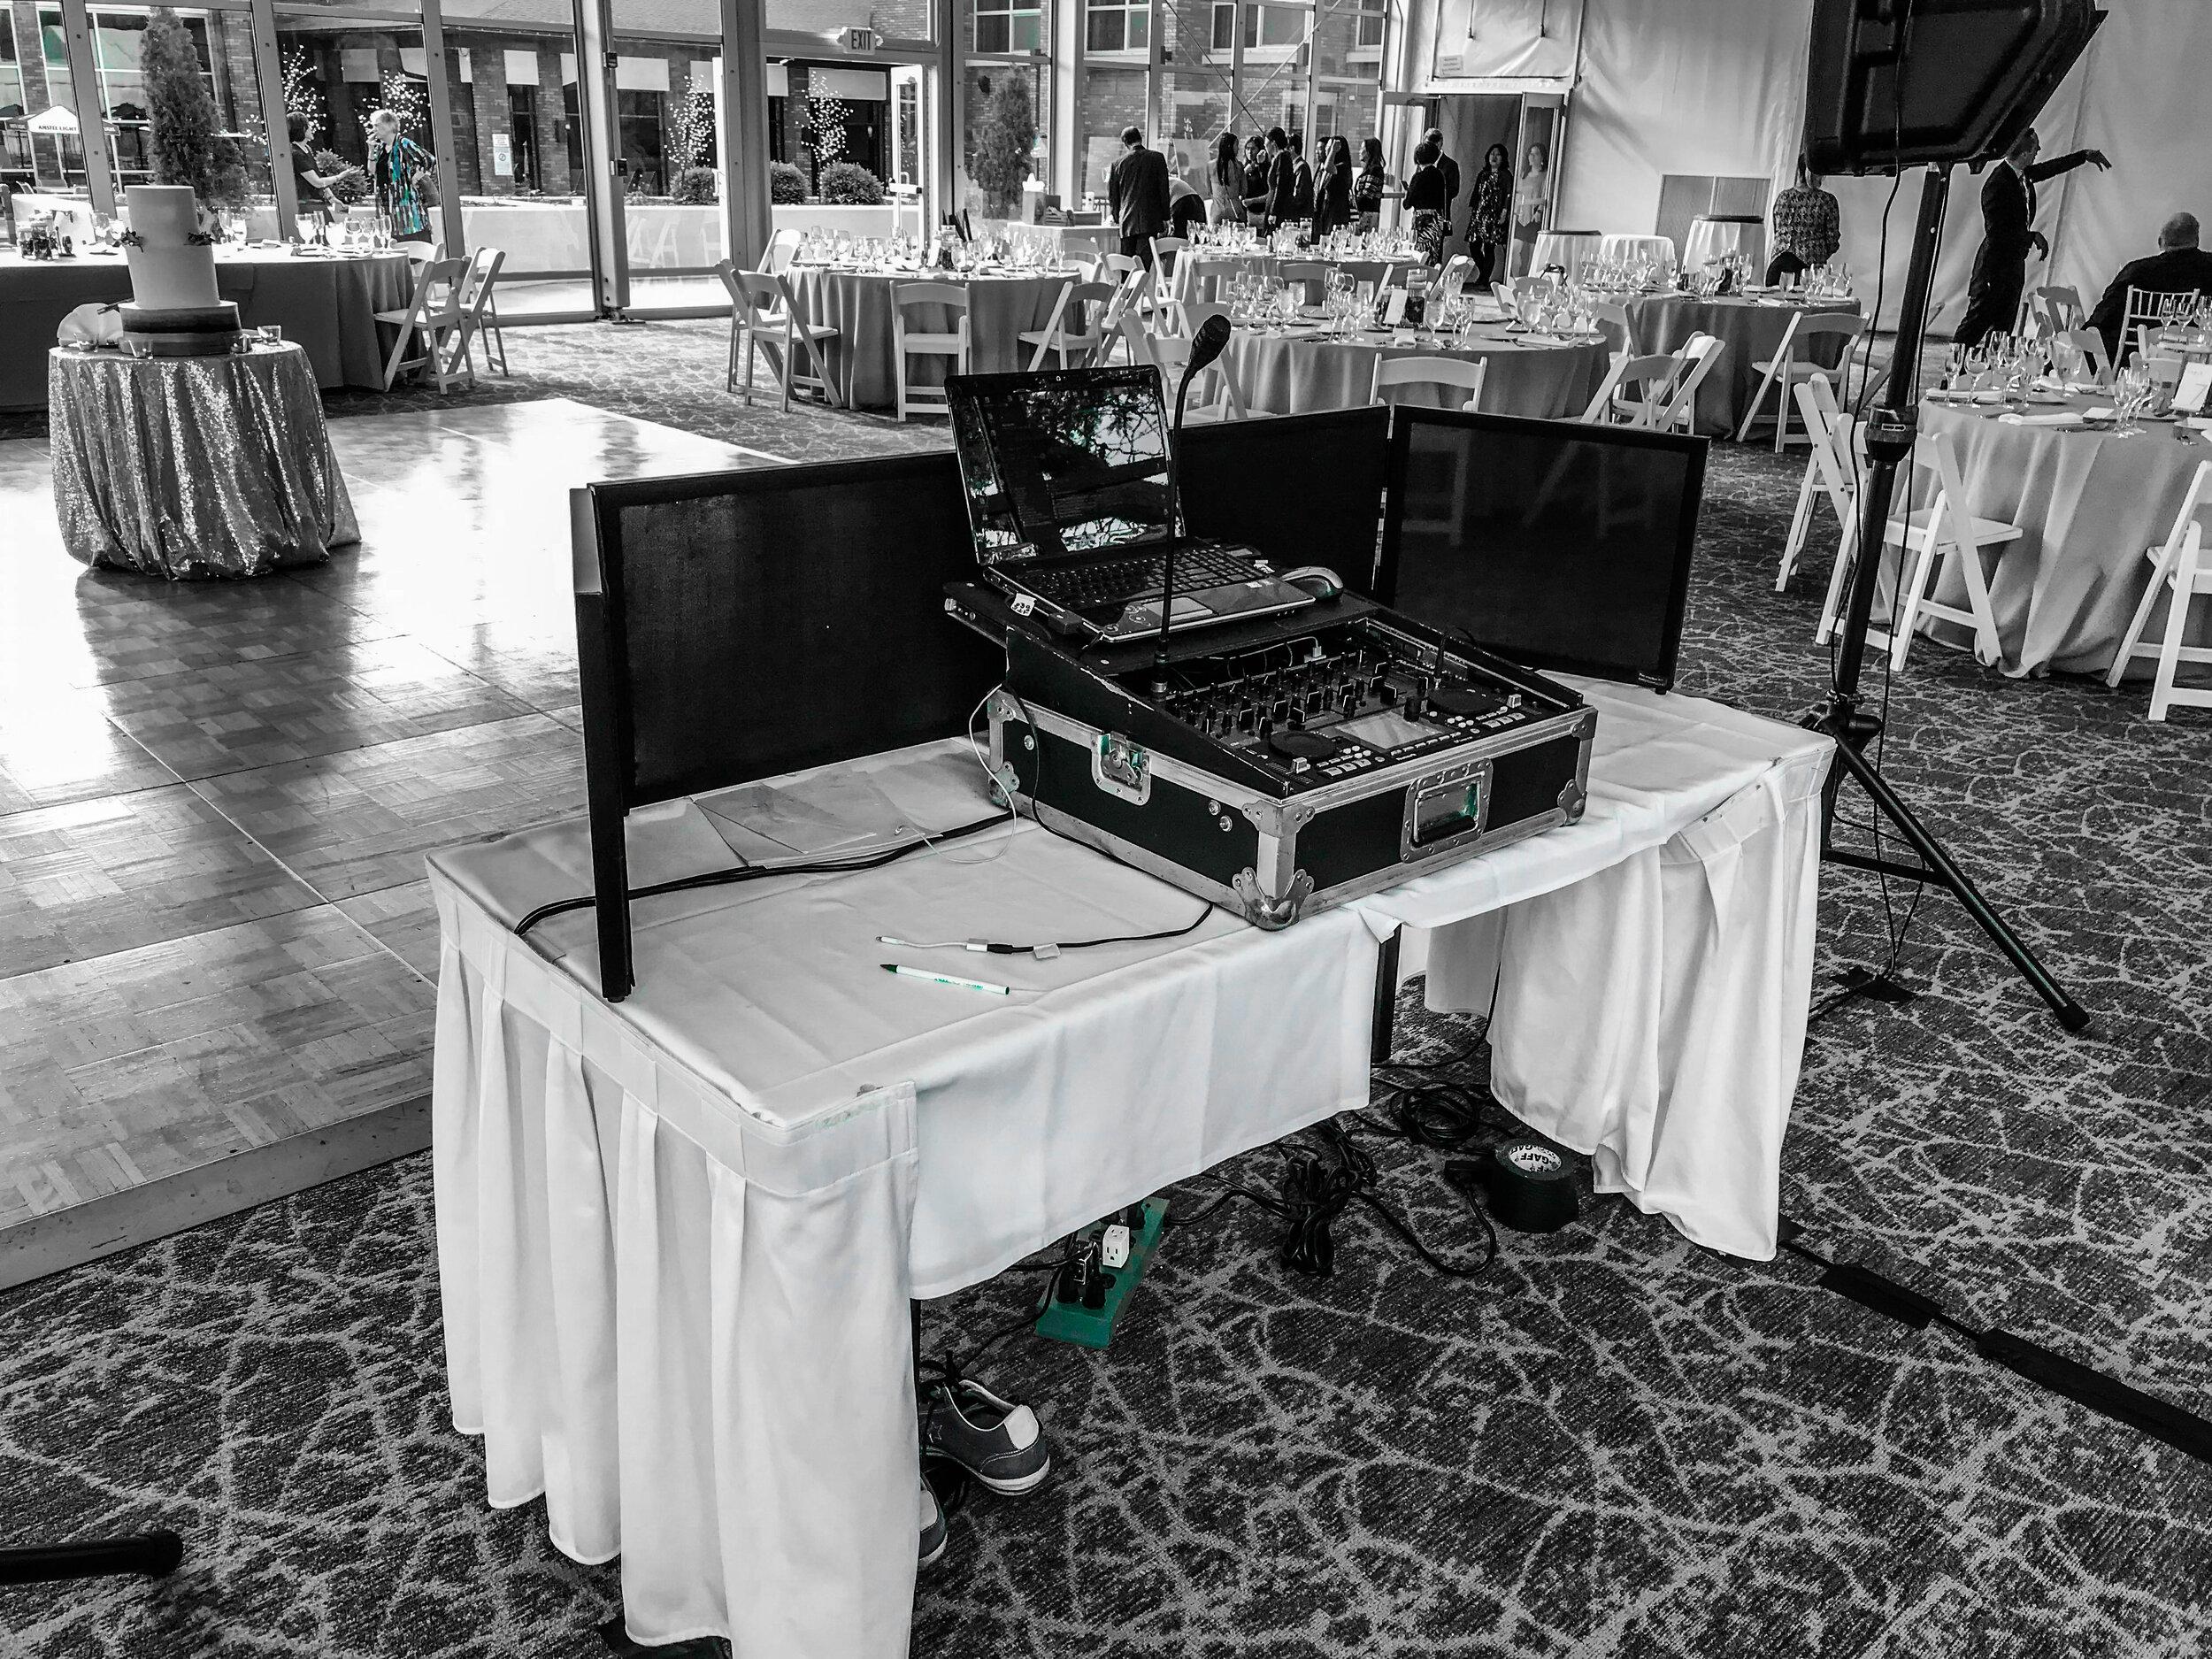 Dancetrax Setup Pics - 2019 - Pic 2.JPG